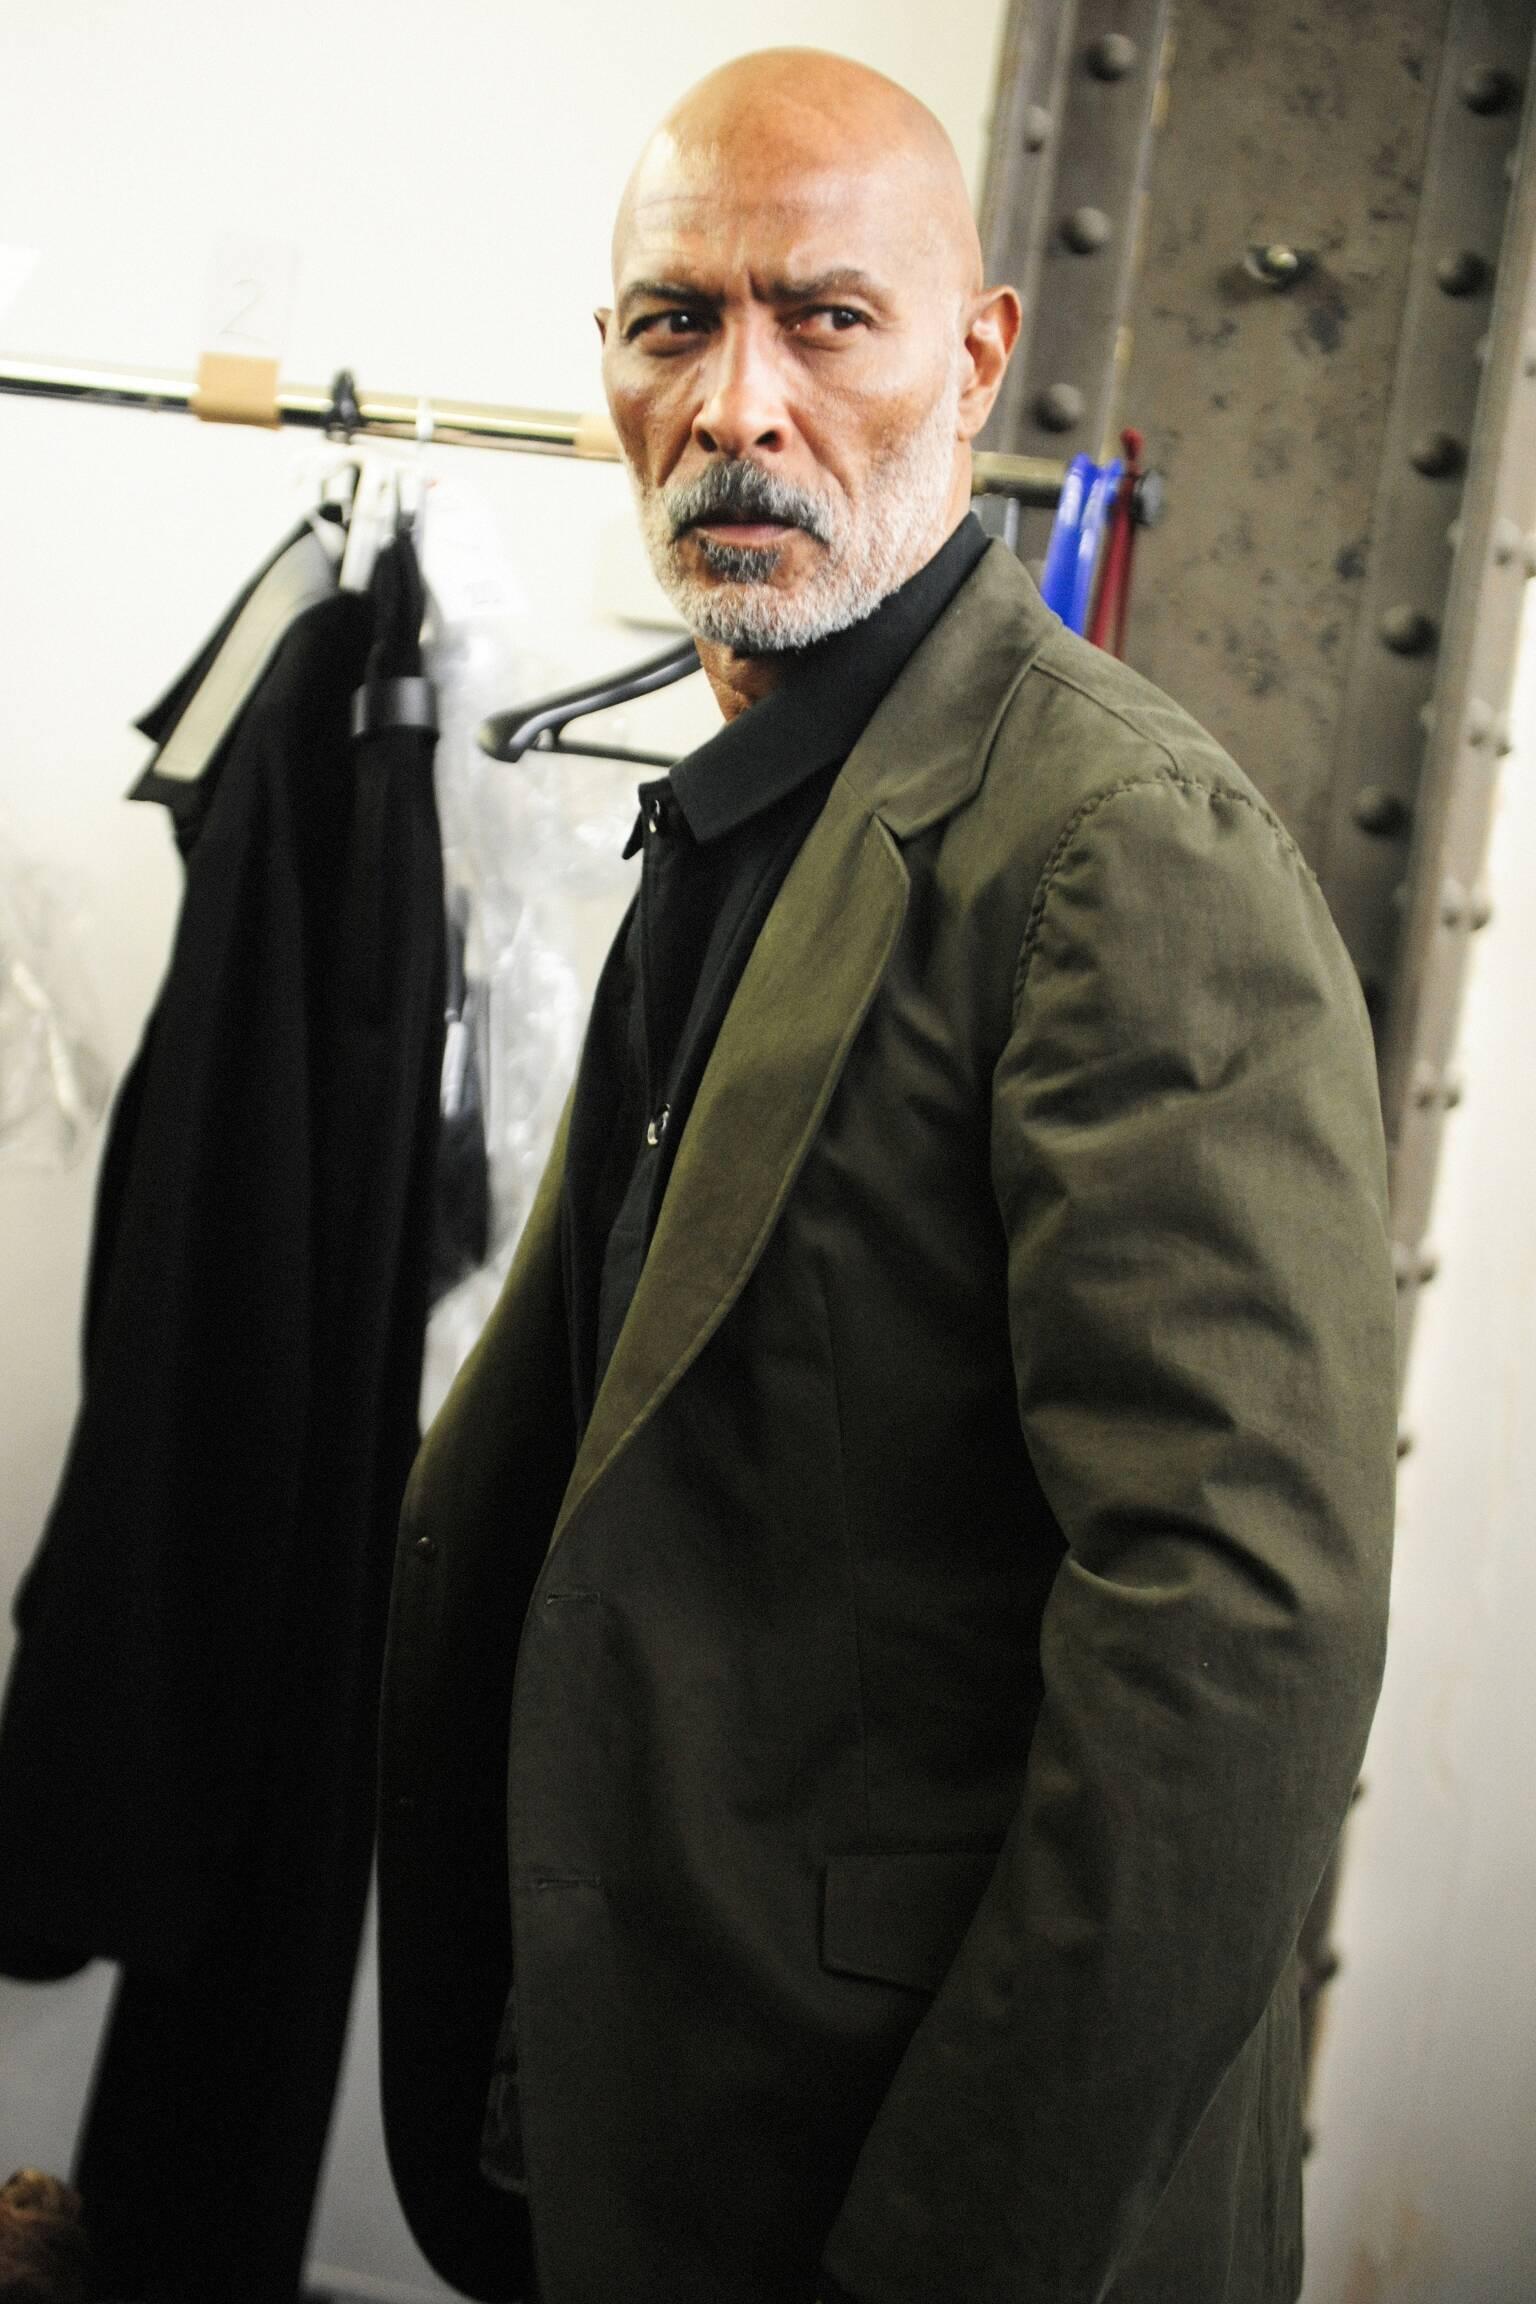 Model Backstage Yohji Yamamoto Paris Fashion Week